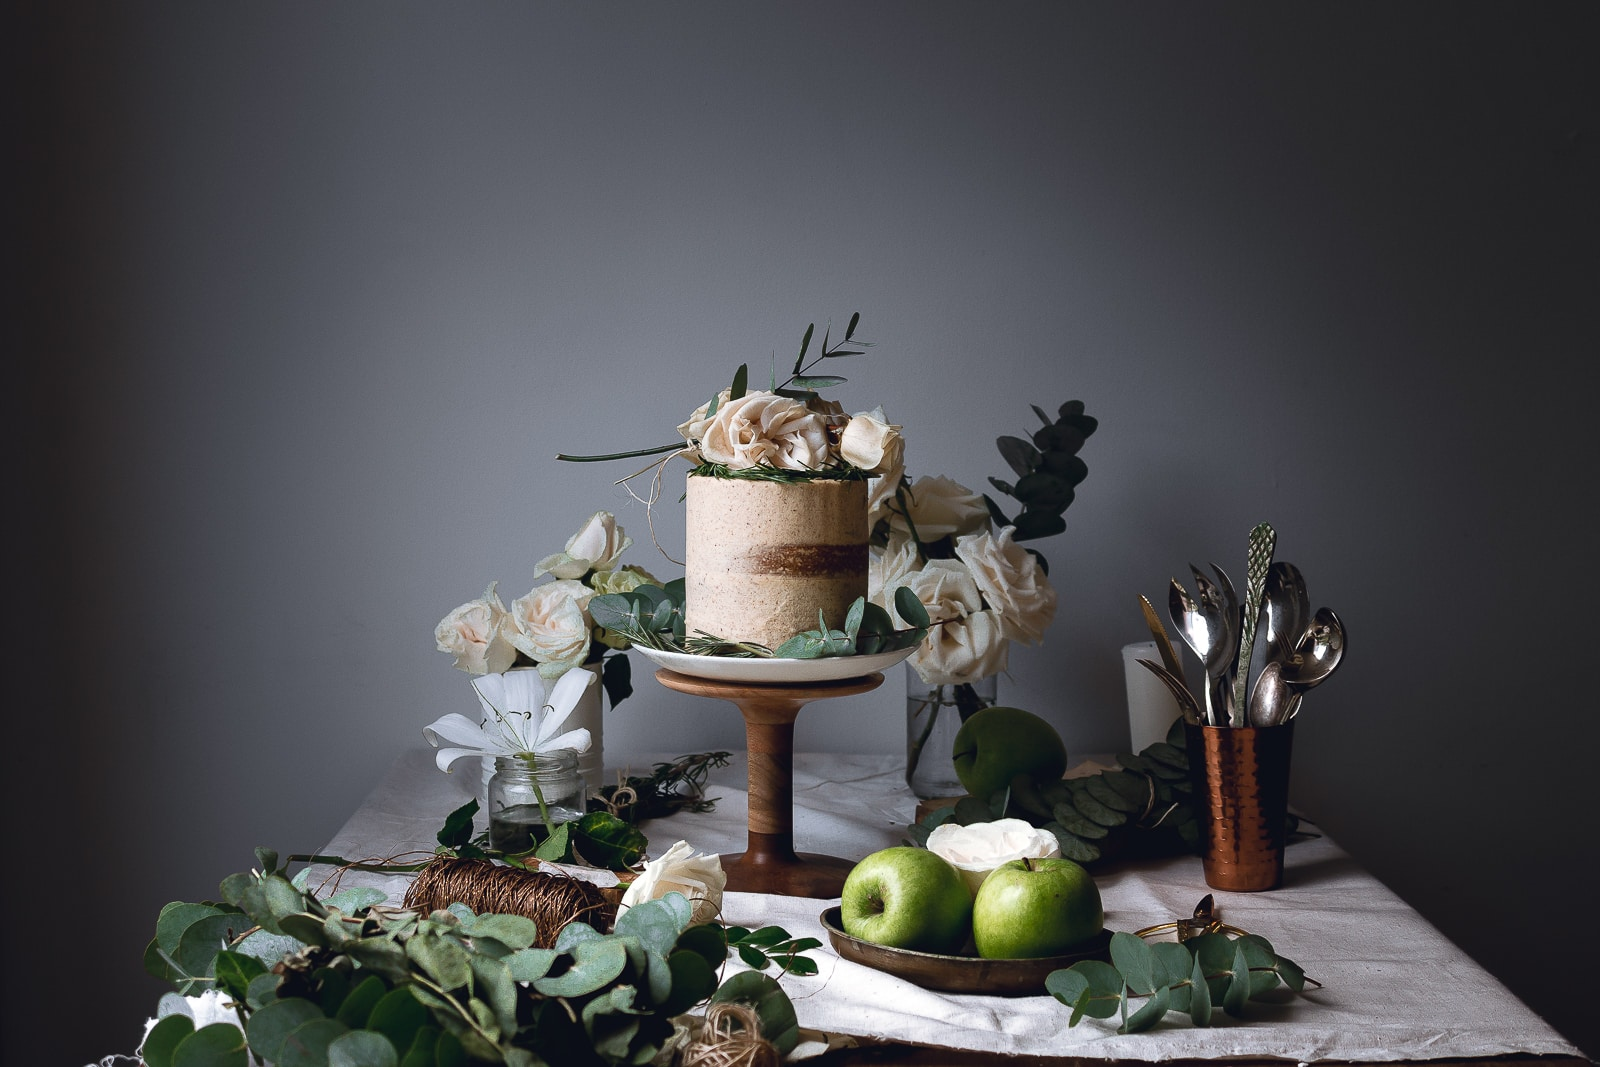 gingerbread-apple-cake-4415